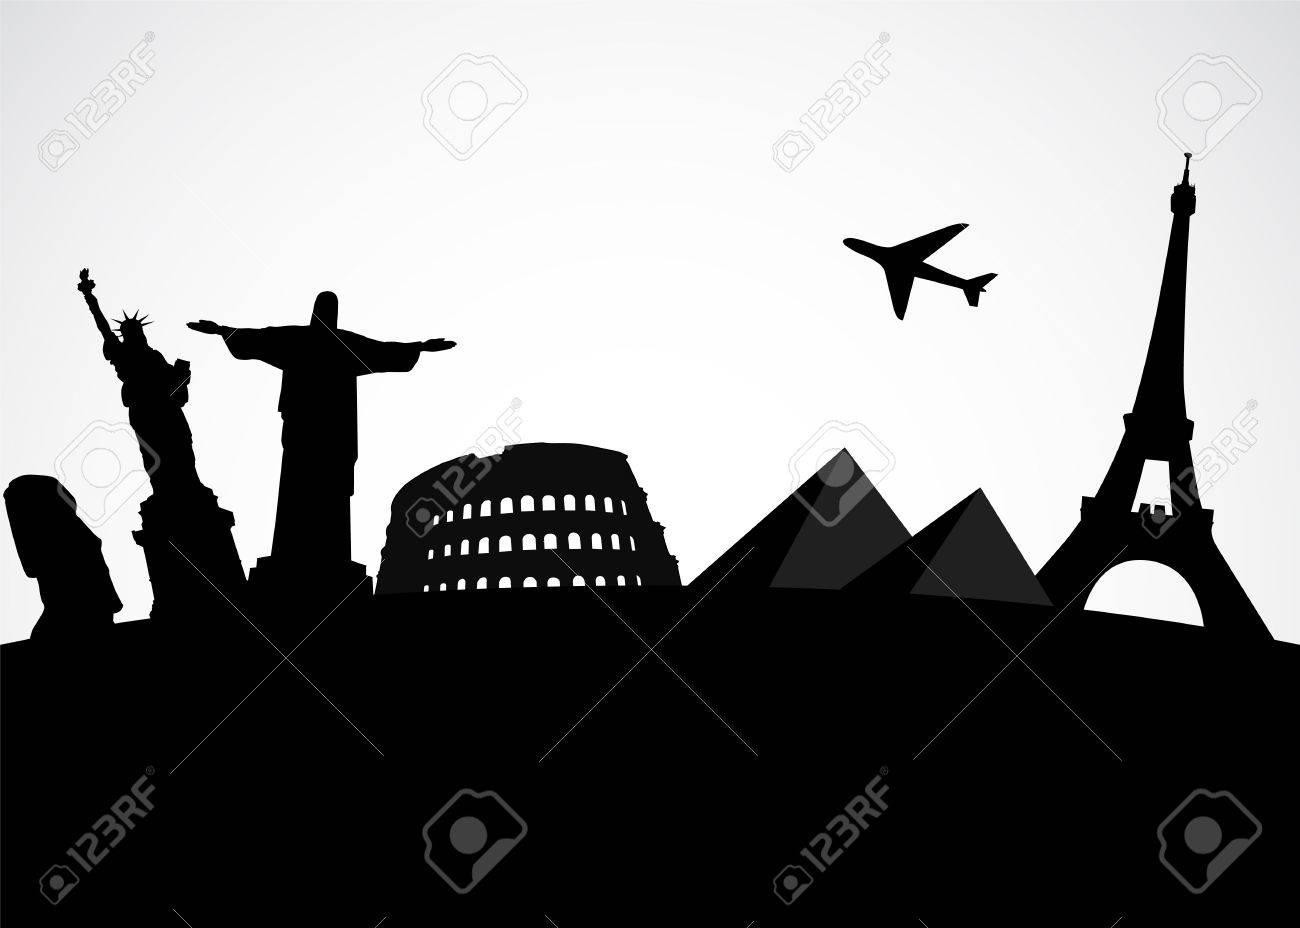 Illustration of world famous monument Vector tourist background - 19420006